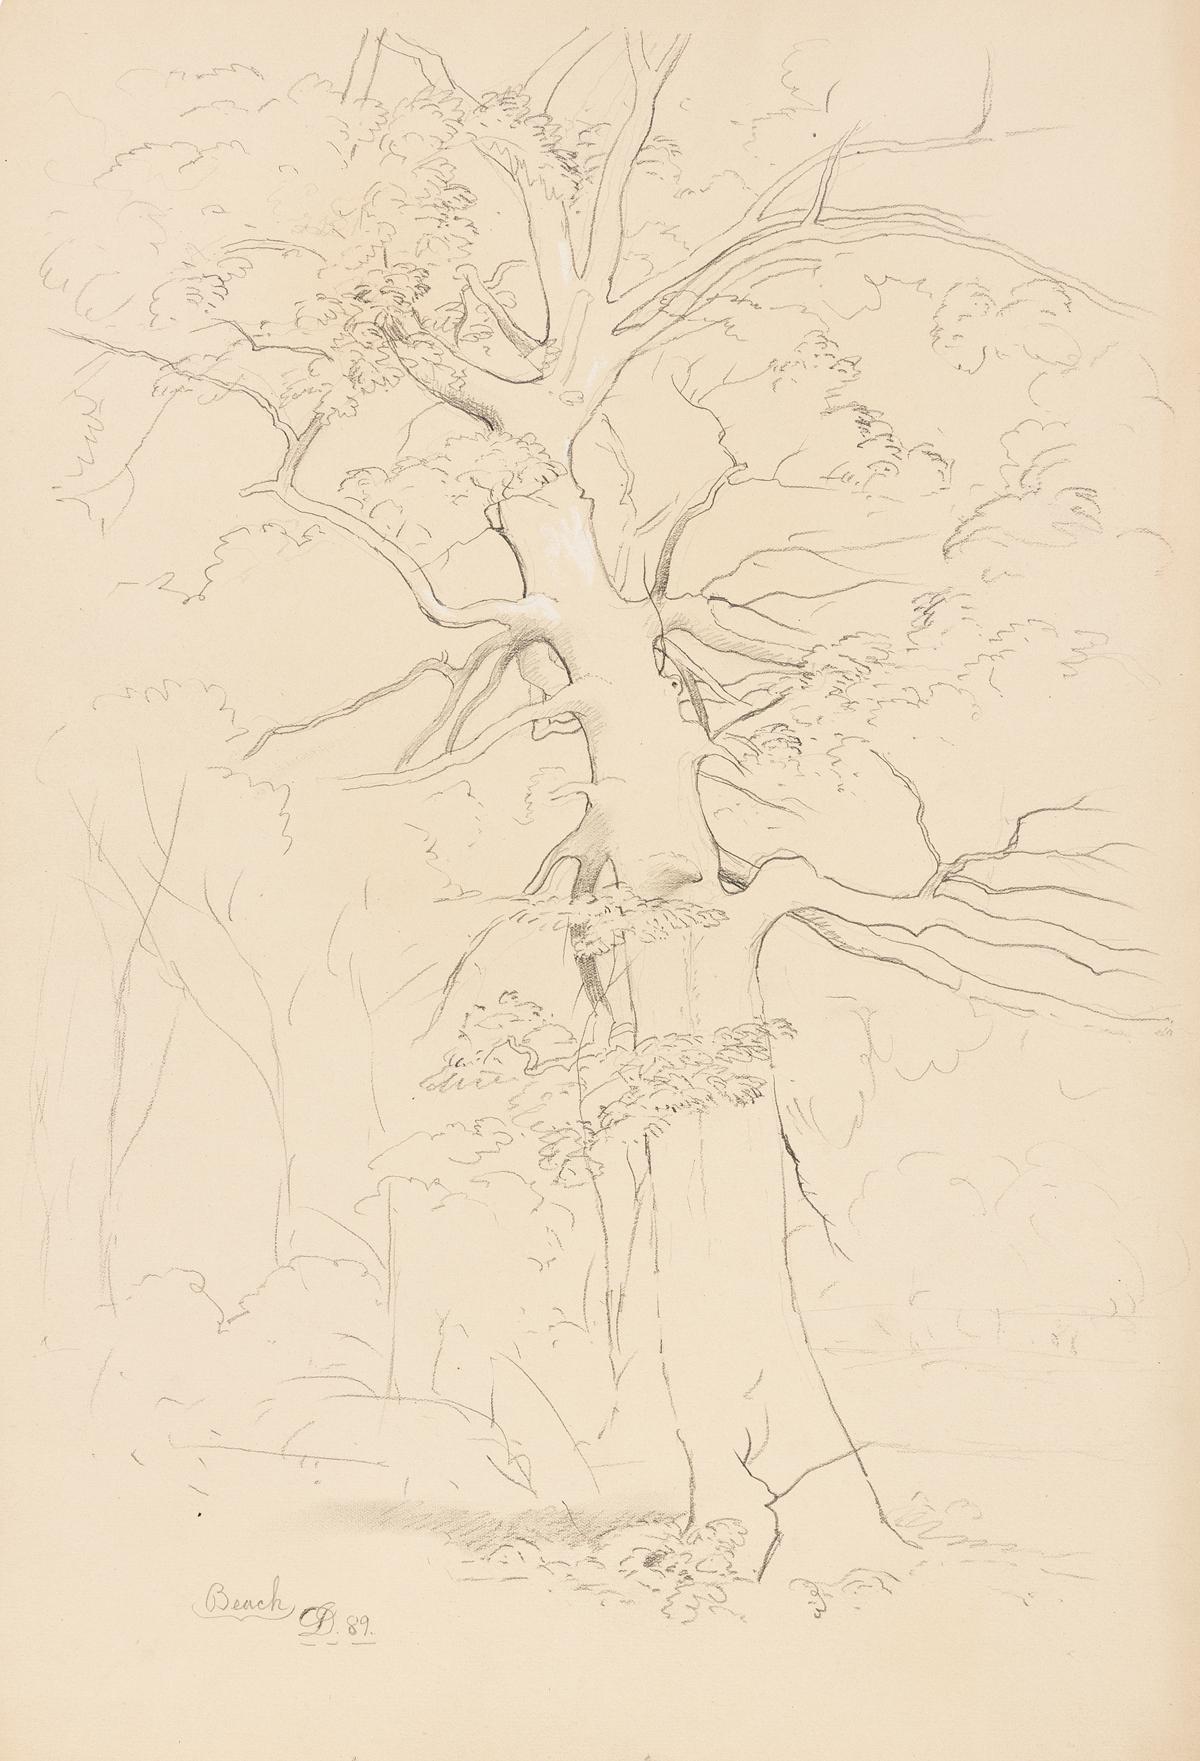 DAVID JOHNSON Two pencil landscape drawings.